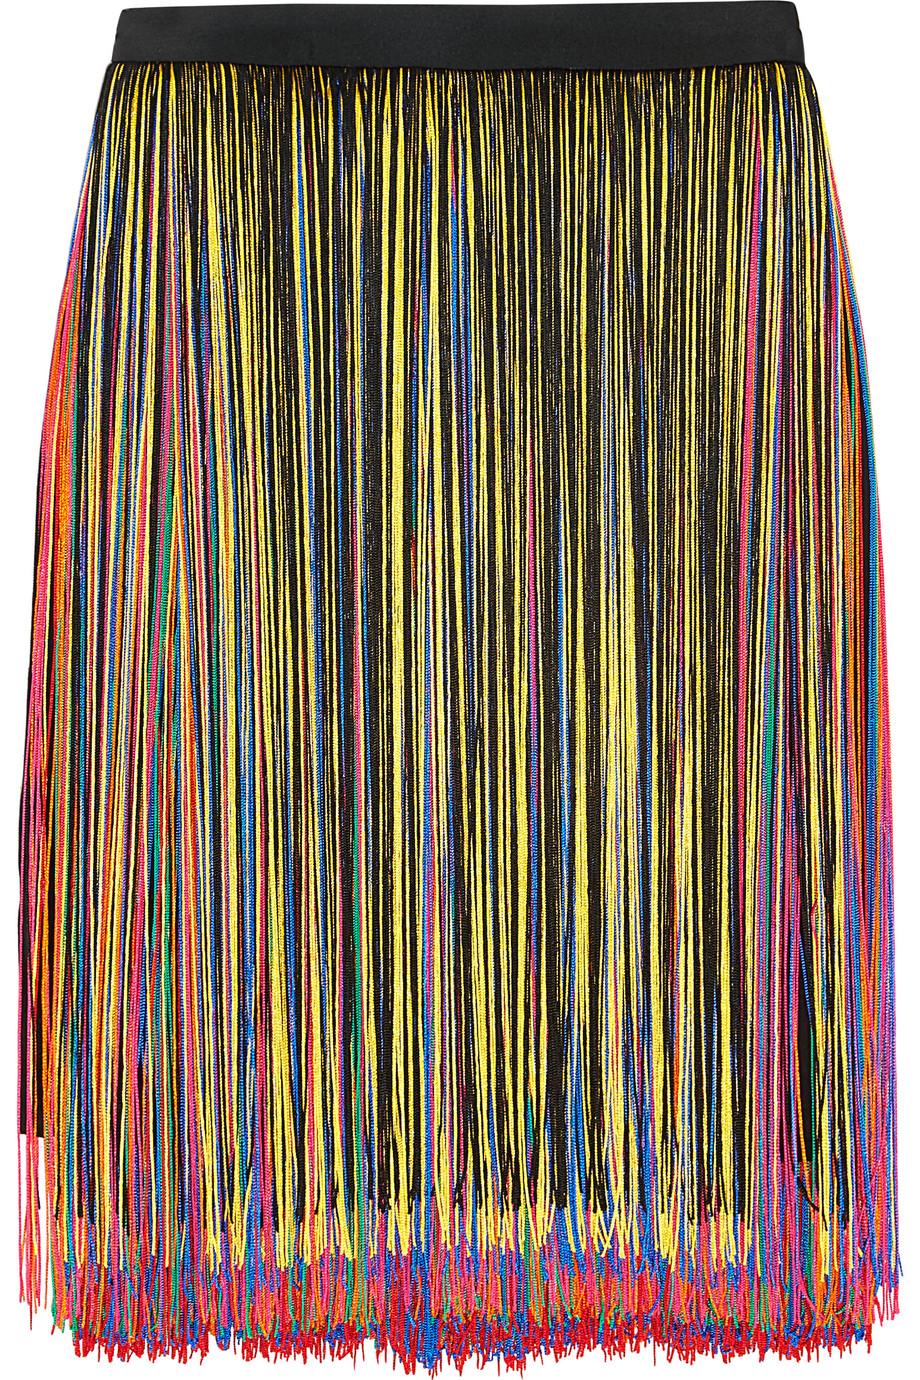 Fringed Stretch-Satin Skirt, Christopher Kane, Black/Yellow, Women's, Size: 14